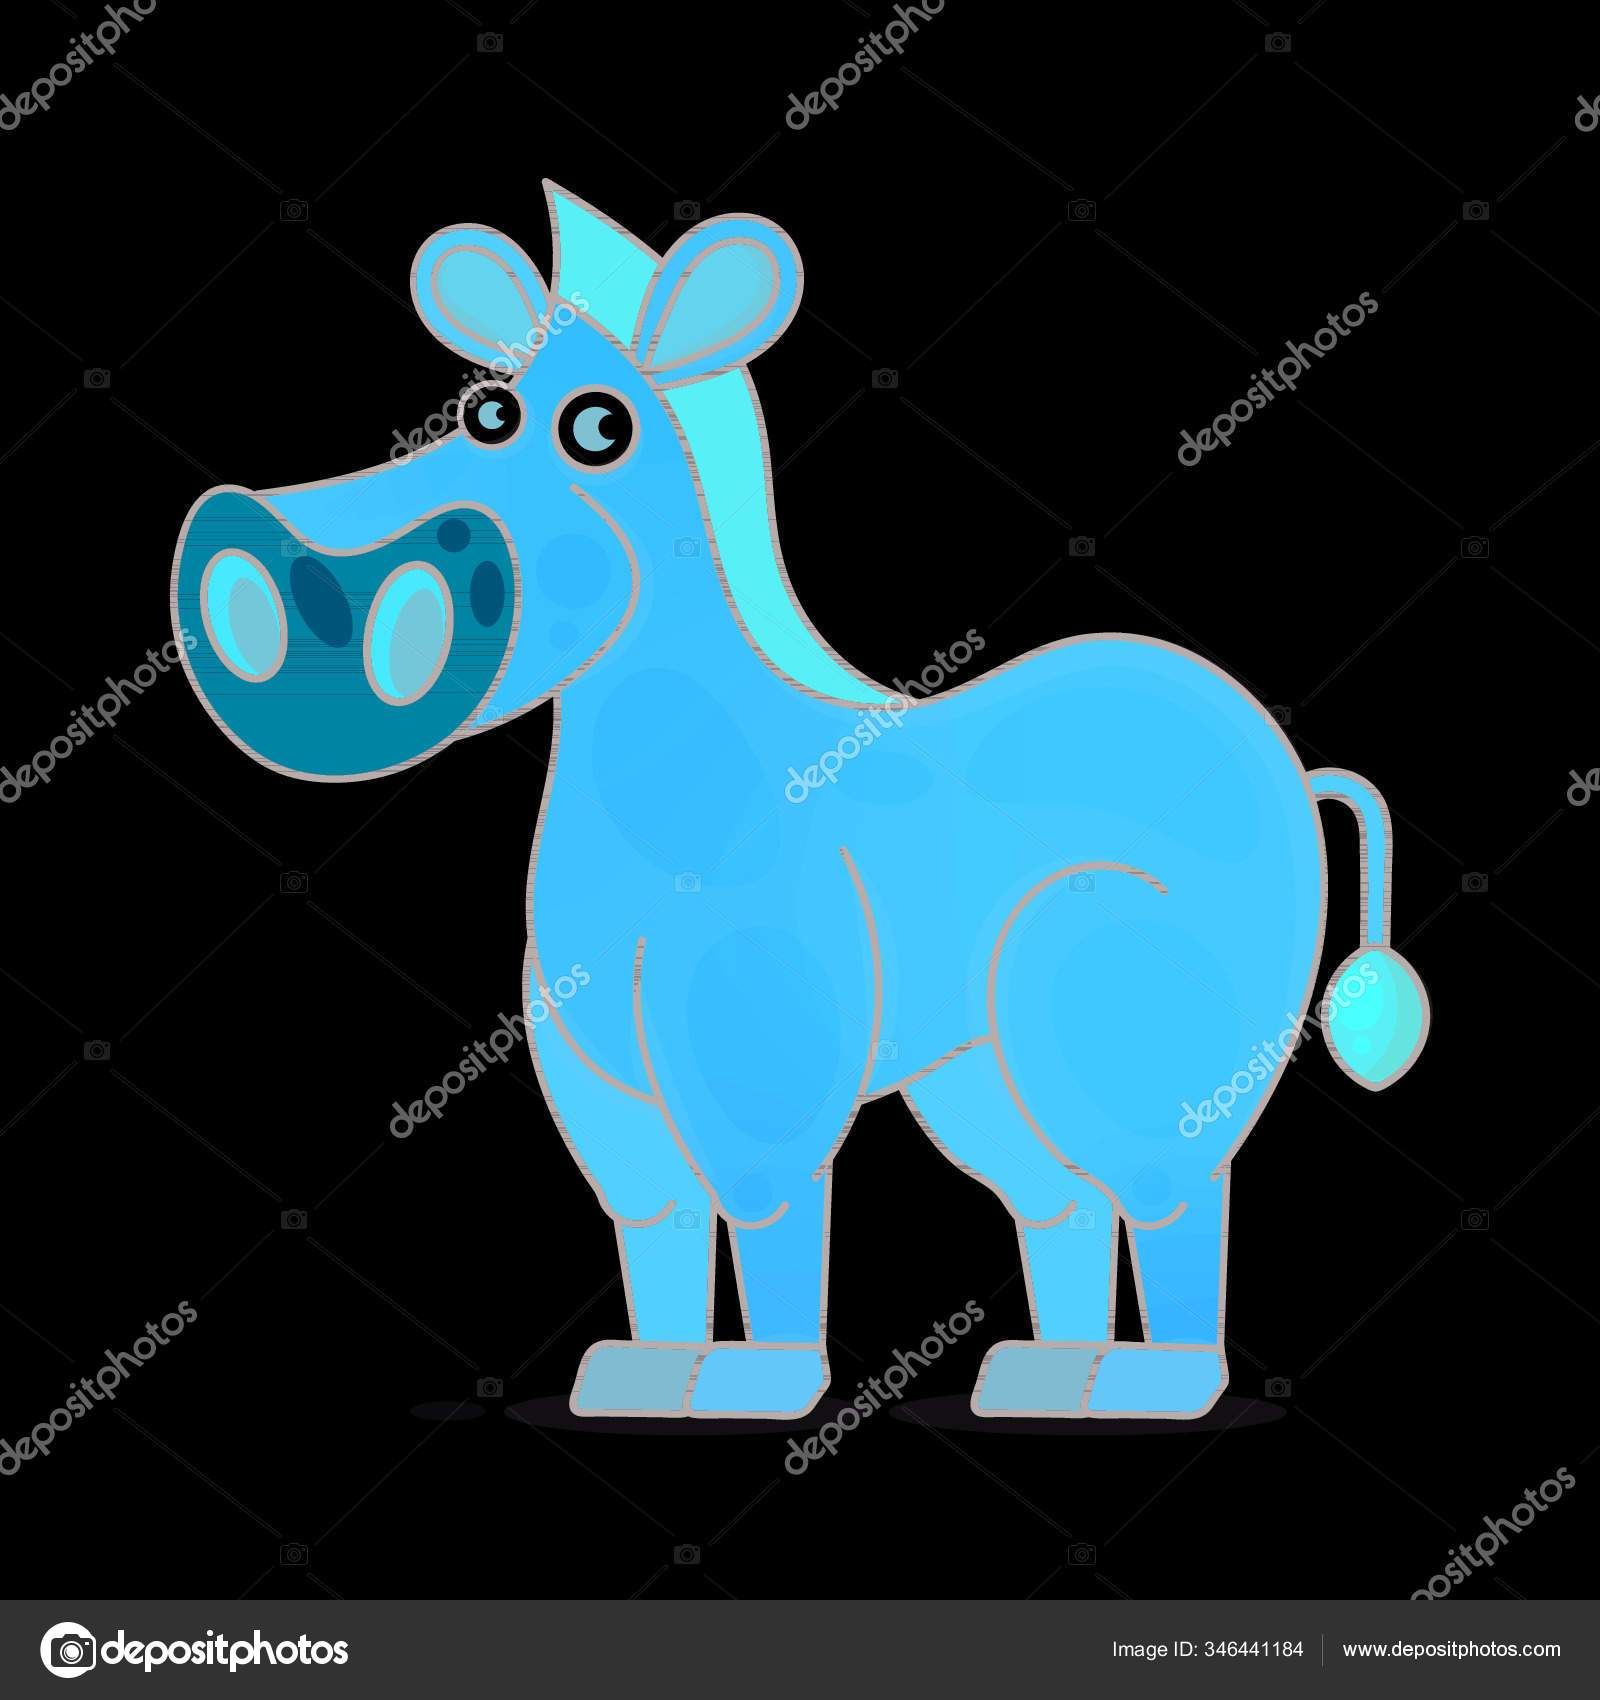 Kuda Dalam Gambar Vektor Gaya Kartun Pada Latar Belakang Putih Stok Vektor C Yayimages 346441184